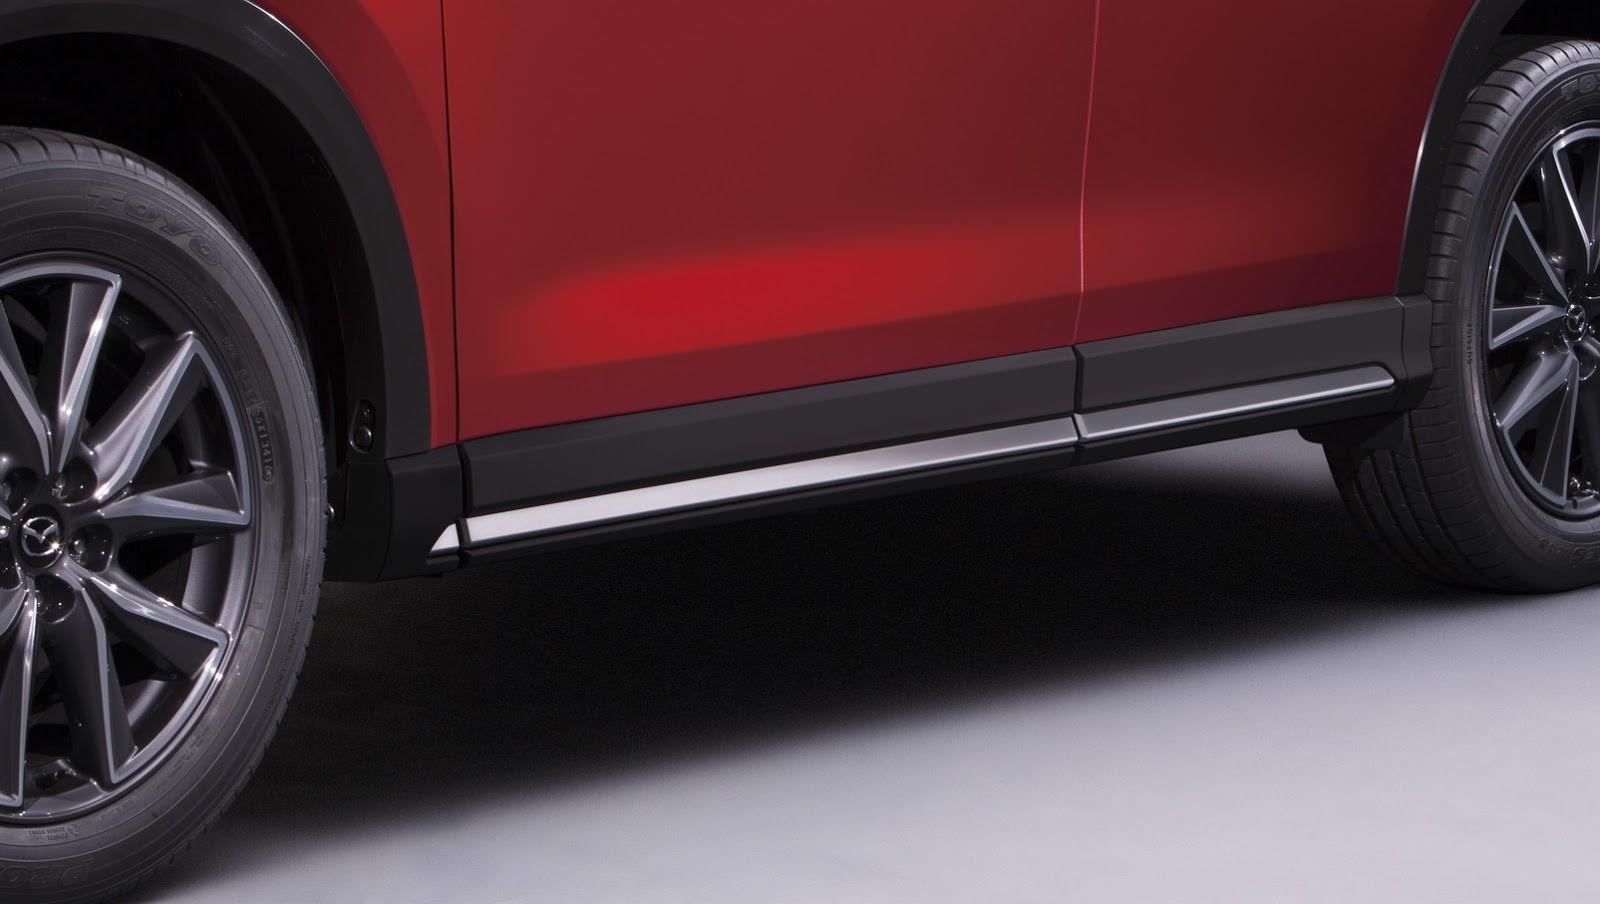 Foto de Accesorios para Mazda CX-3 - CX-5 (11/12)